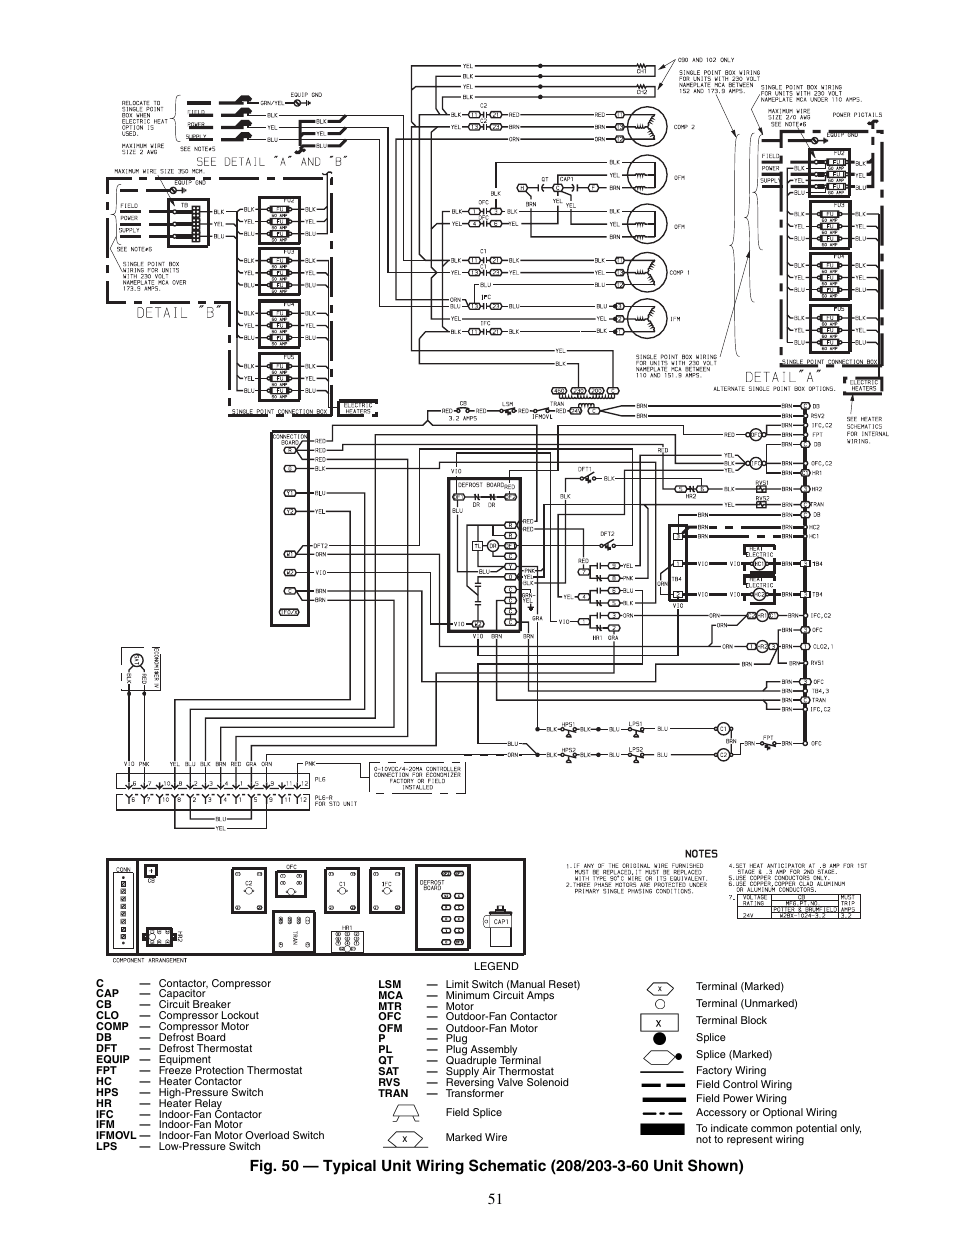 Rheem X 13 Motor Wiring Diagram Auto Electrical Ge Ecm X13 Air Handler Hvac Ajm 3 Heat Pump